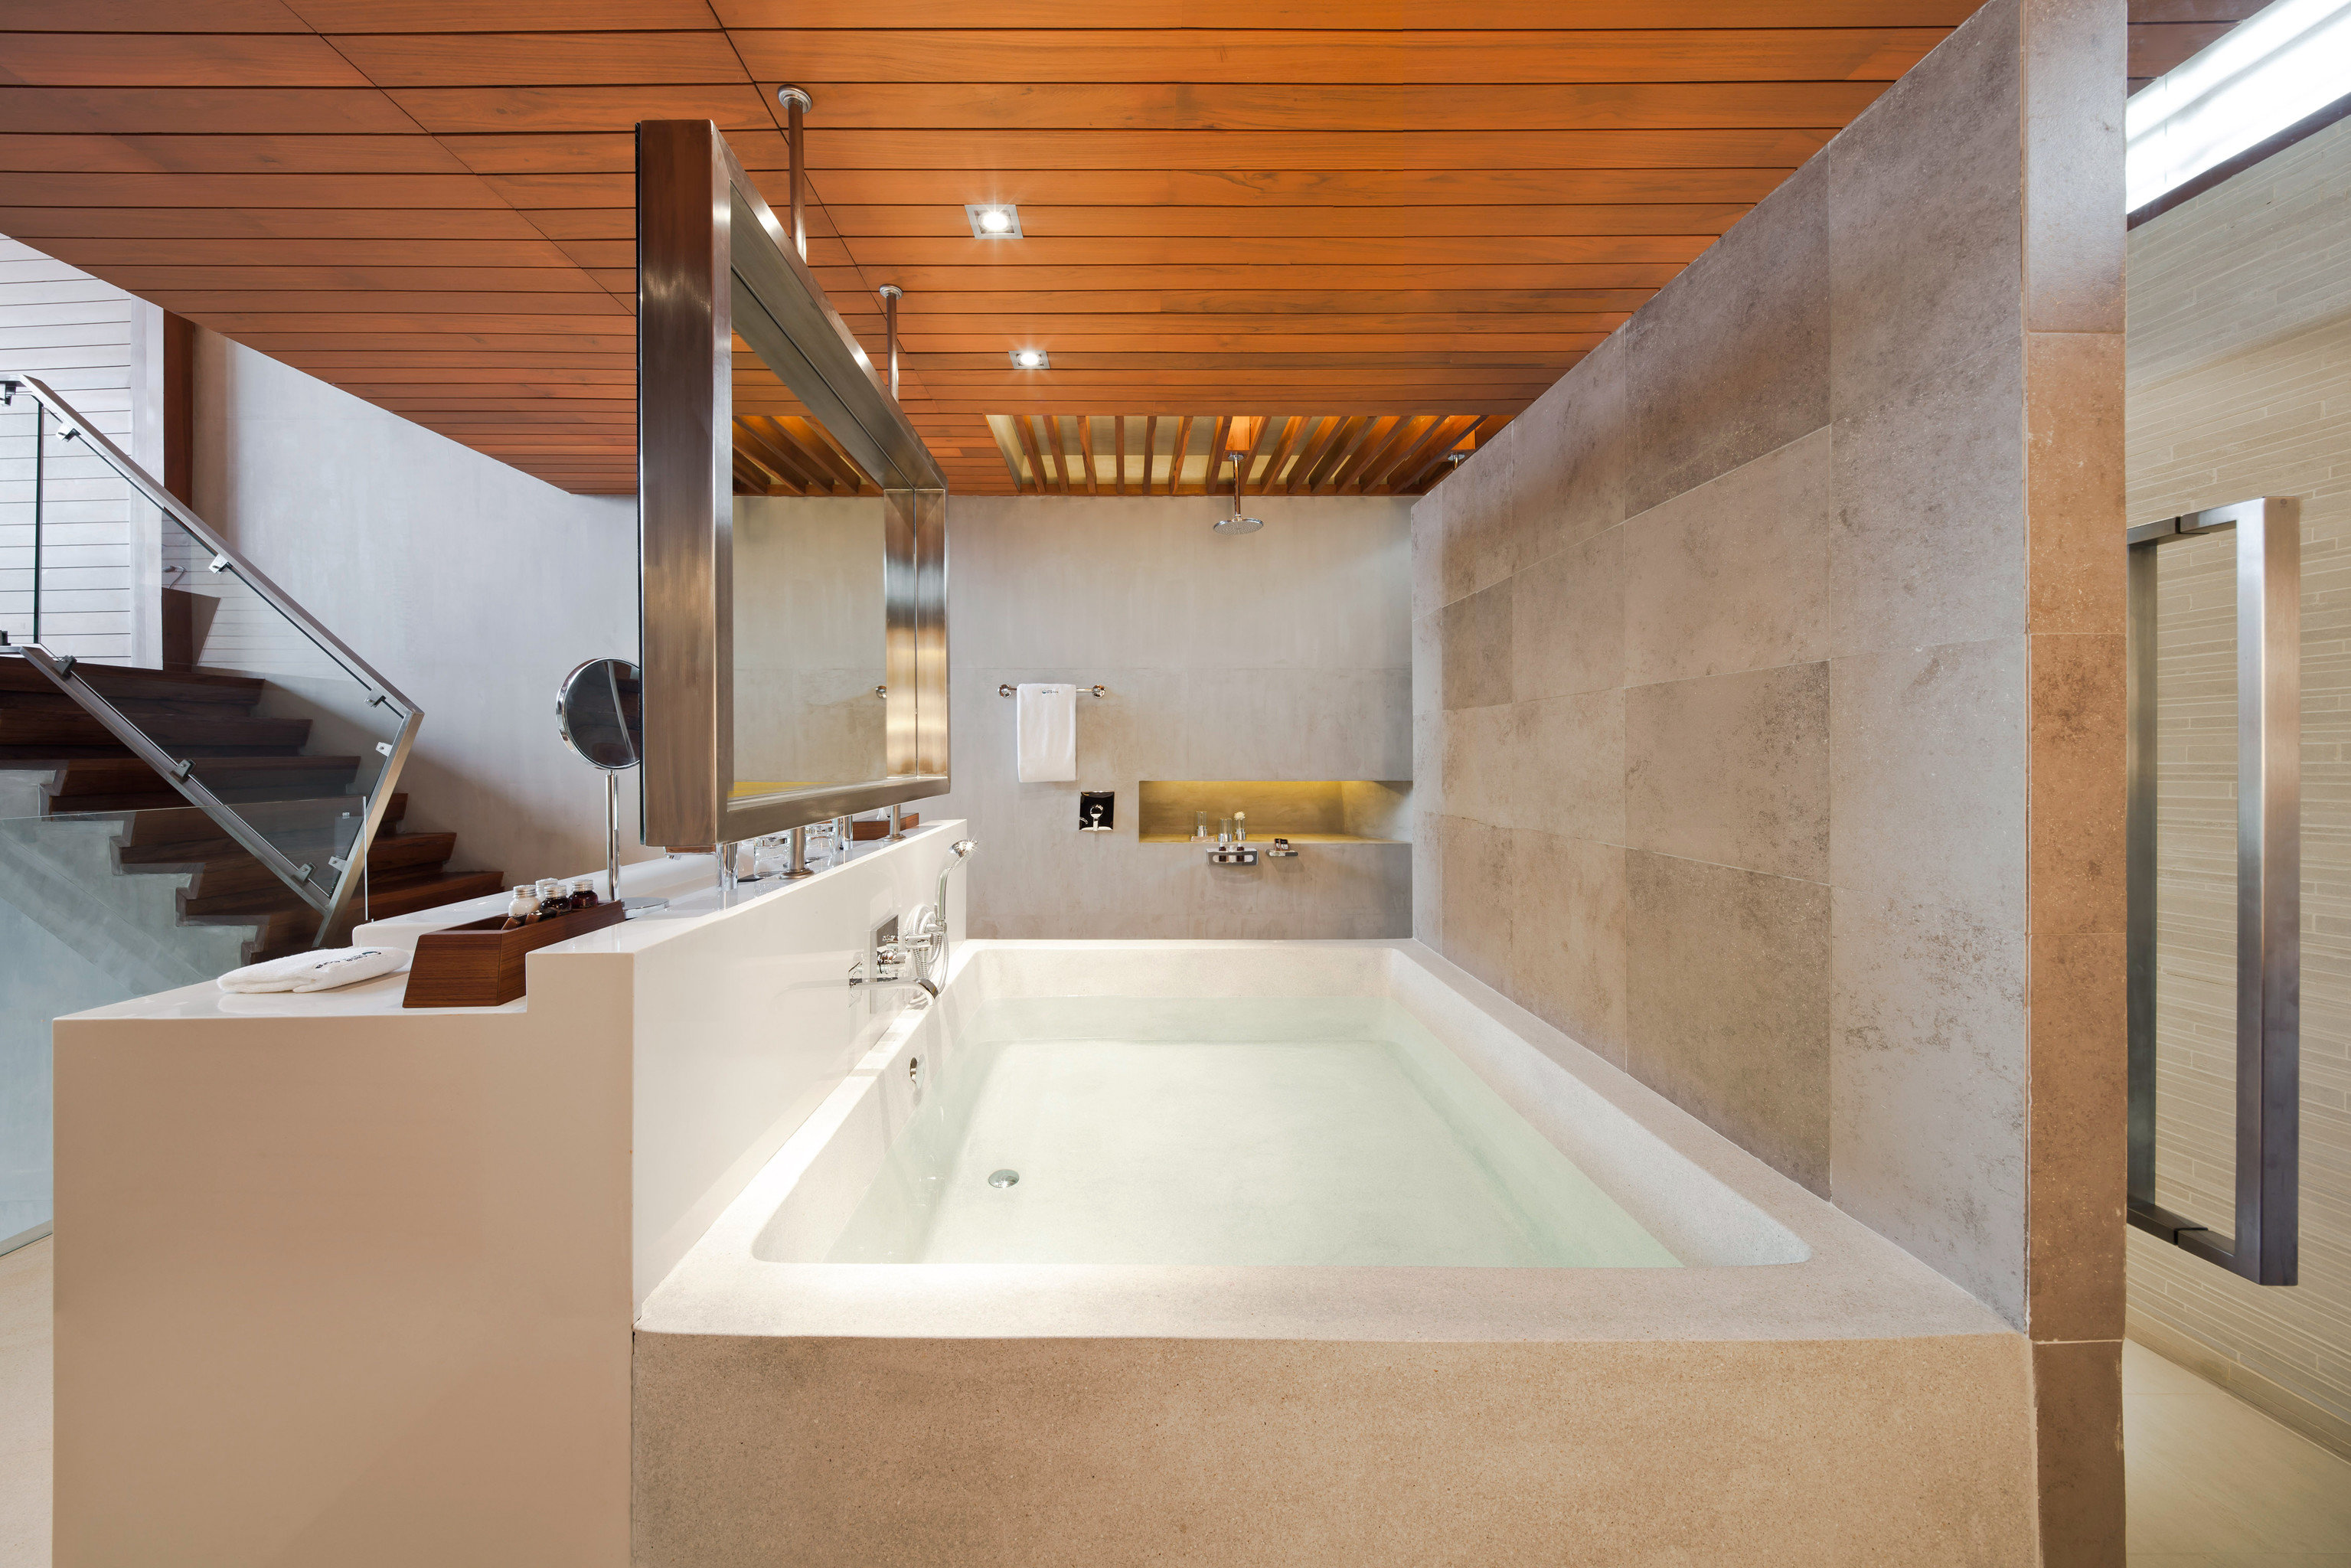 Bath Beachfront Bedroom Modern Romantic property house bathroom home plumbing fixture daylighting bathtub flooring sink